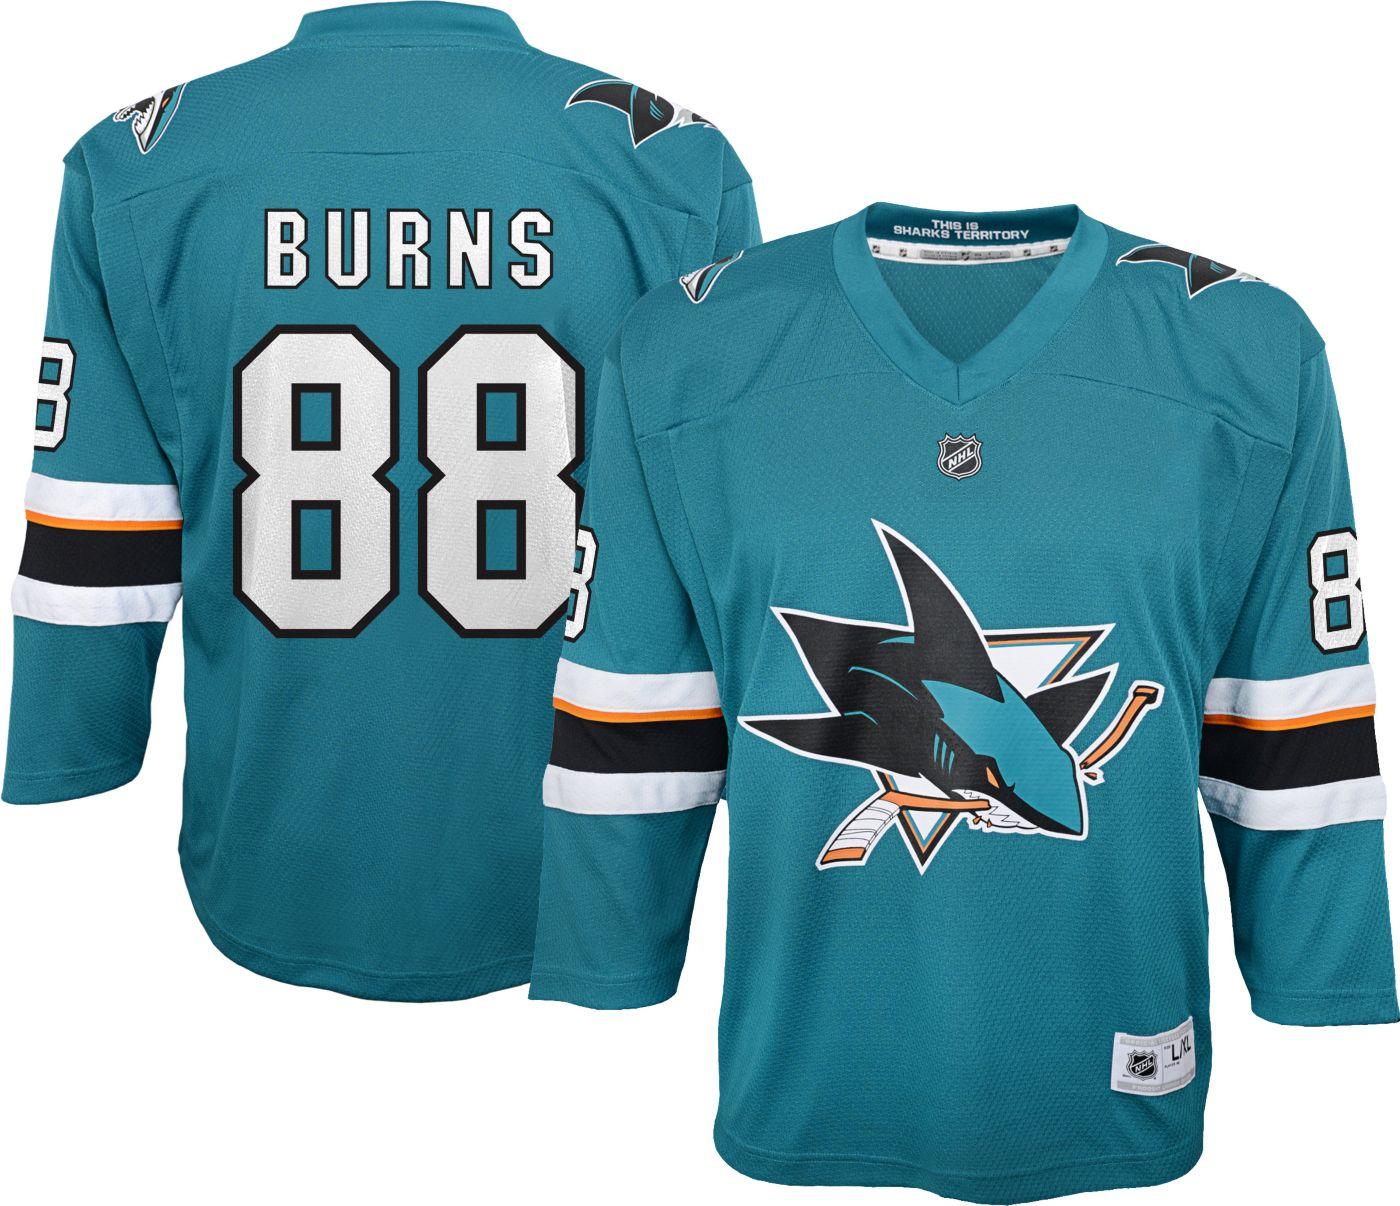 NHL Youth San Jose Sharks Brent Burns #88 Replica Home Jersey